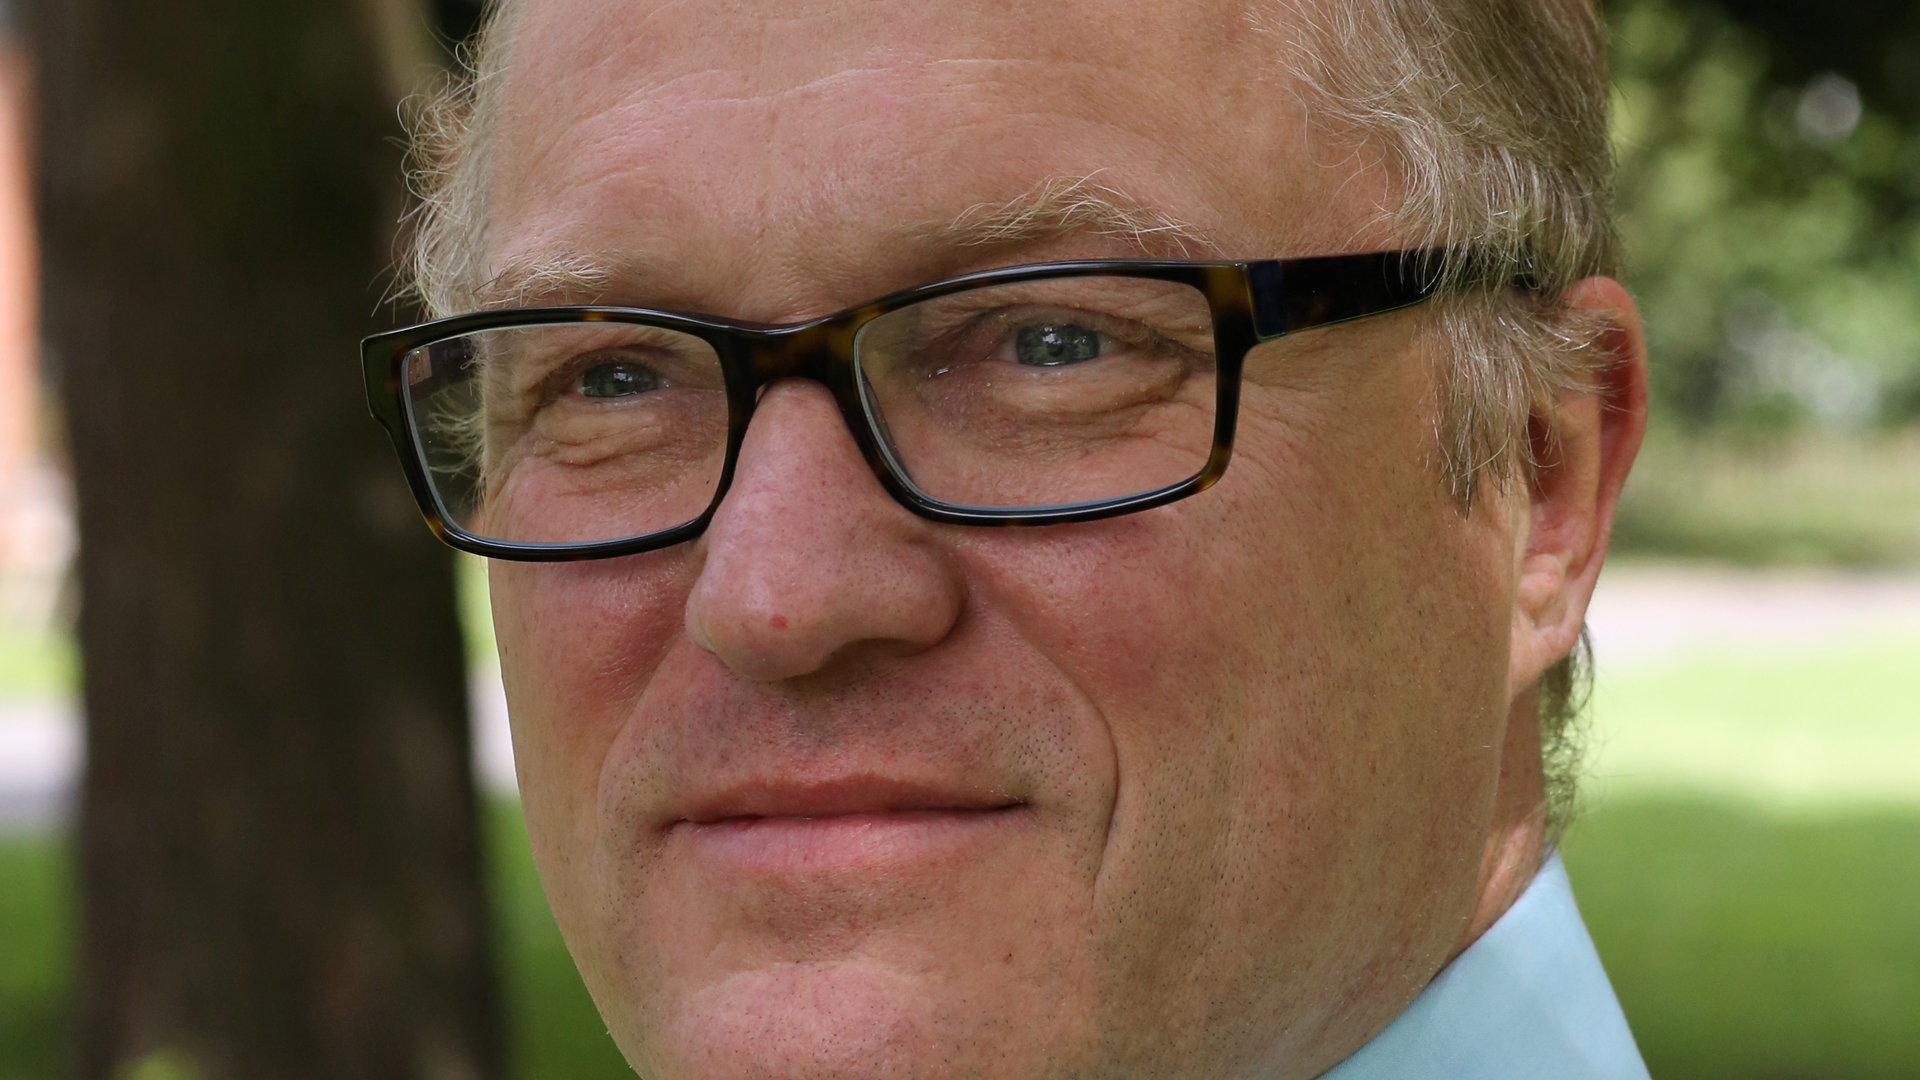 Heiko Ehrhardt beschäftigt sich als Pfarrer mit Comics